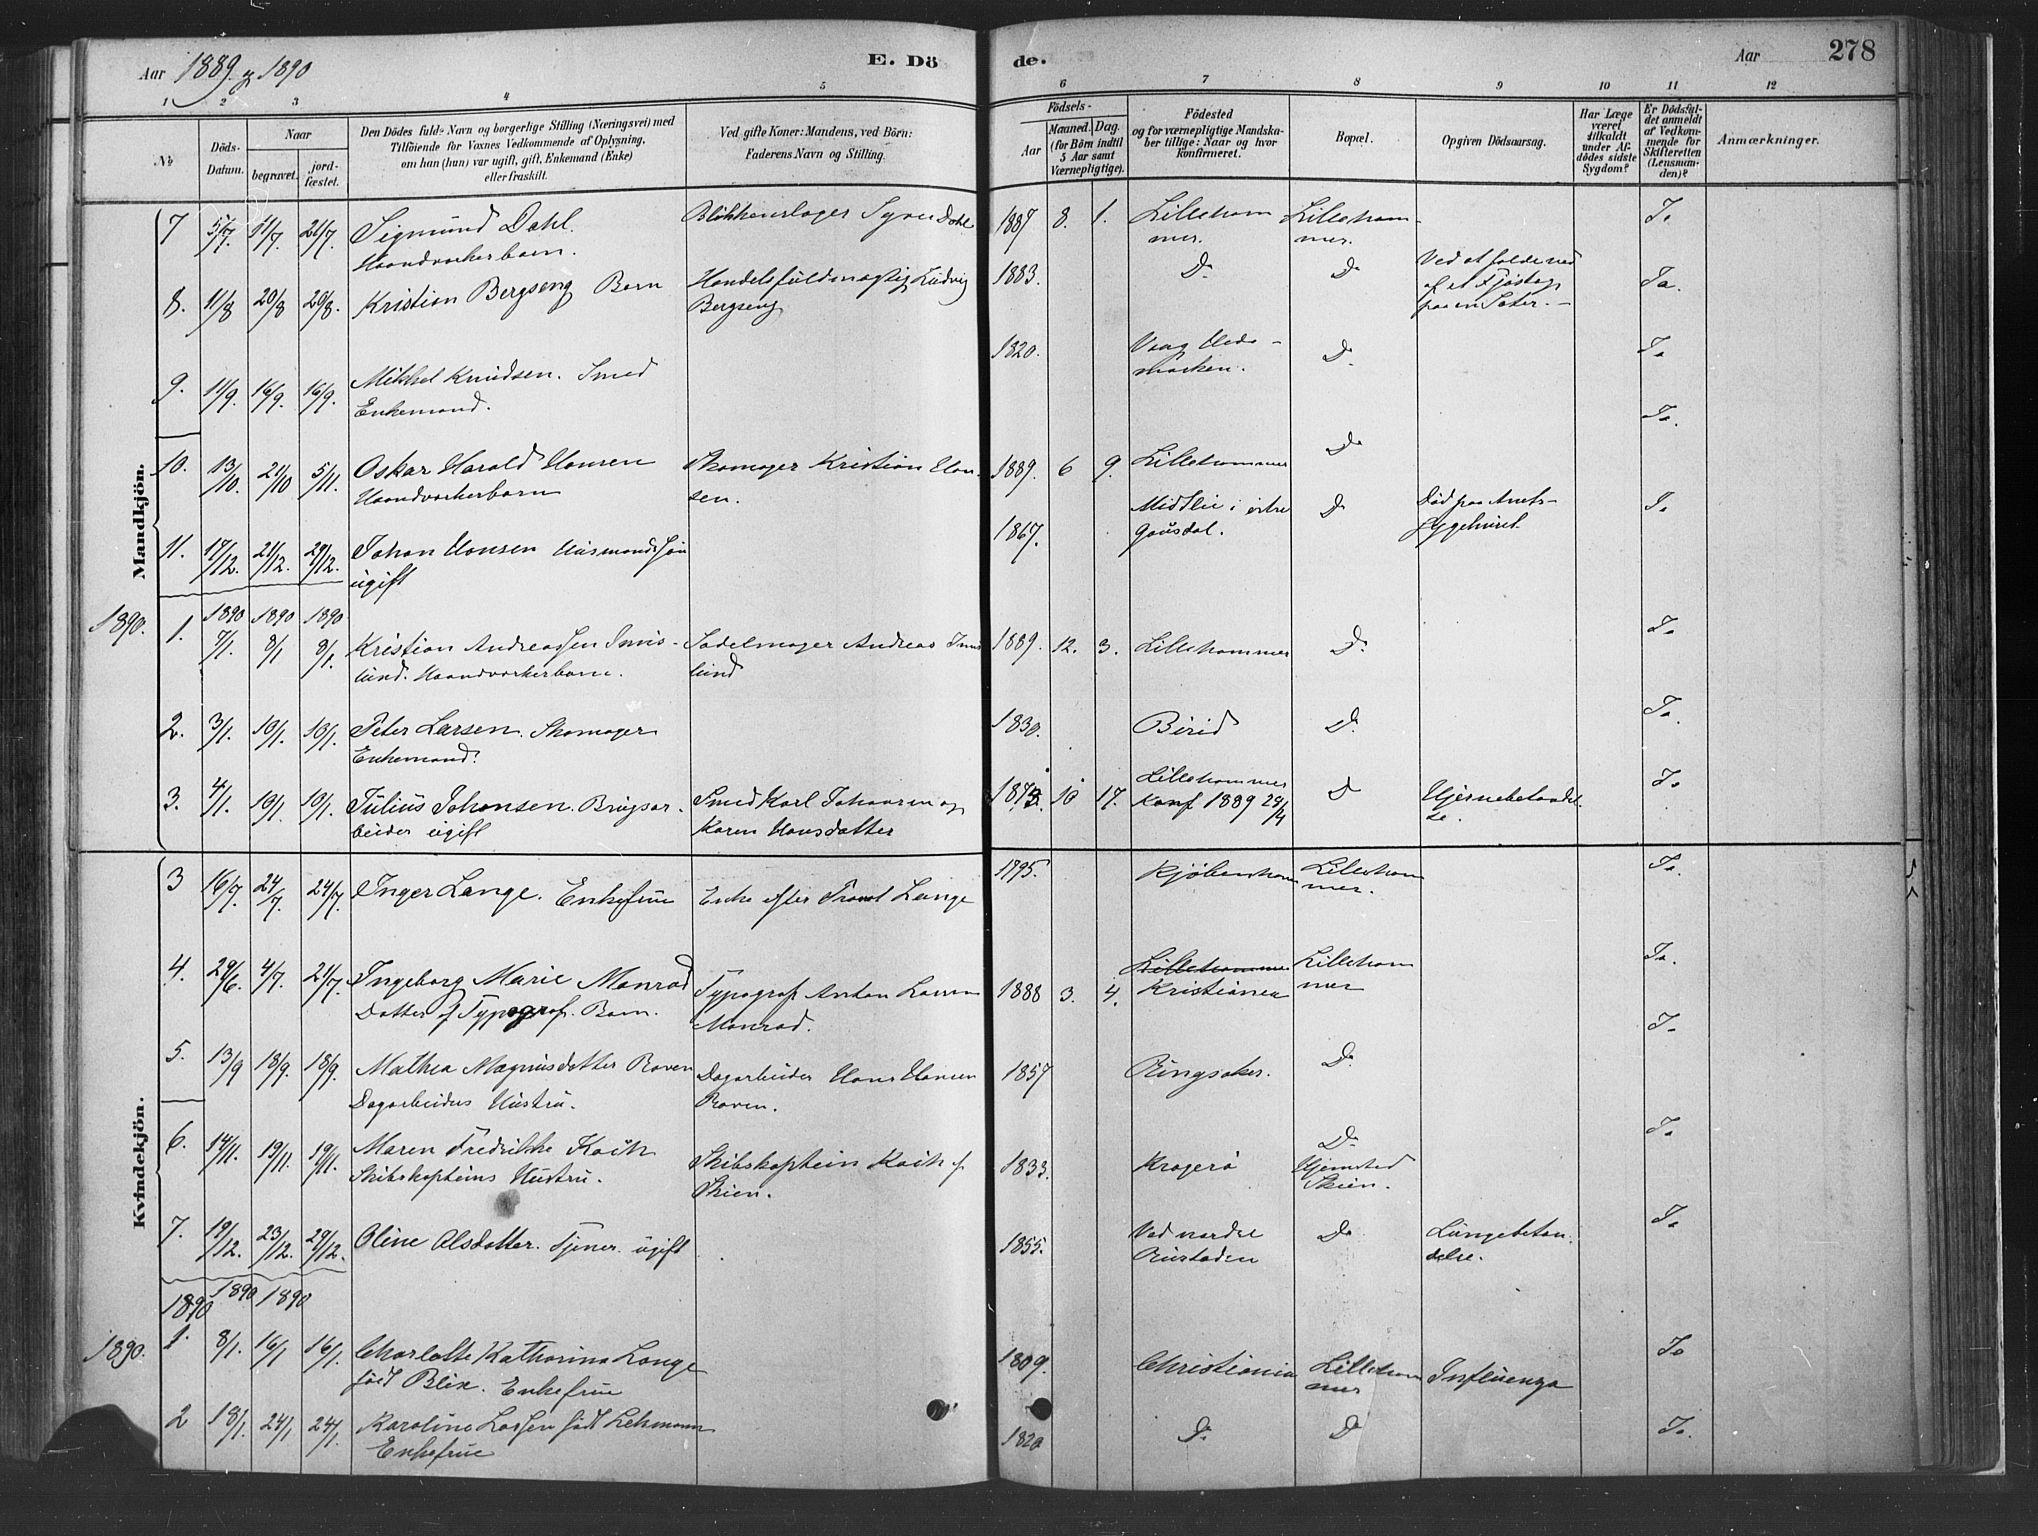 SAH, Fåberg prestekontor, H/Ha/Haa/L0010: Parish register (official) no. 10, 1879-1900, p. 278